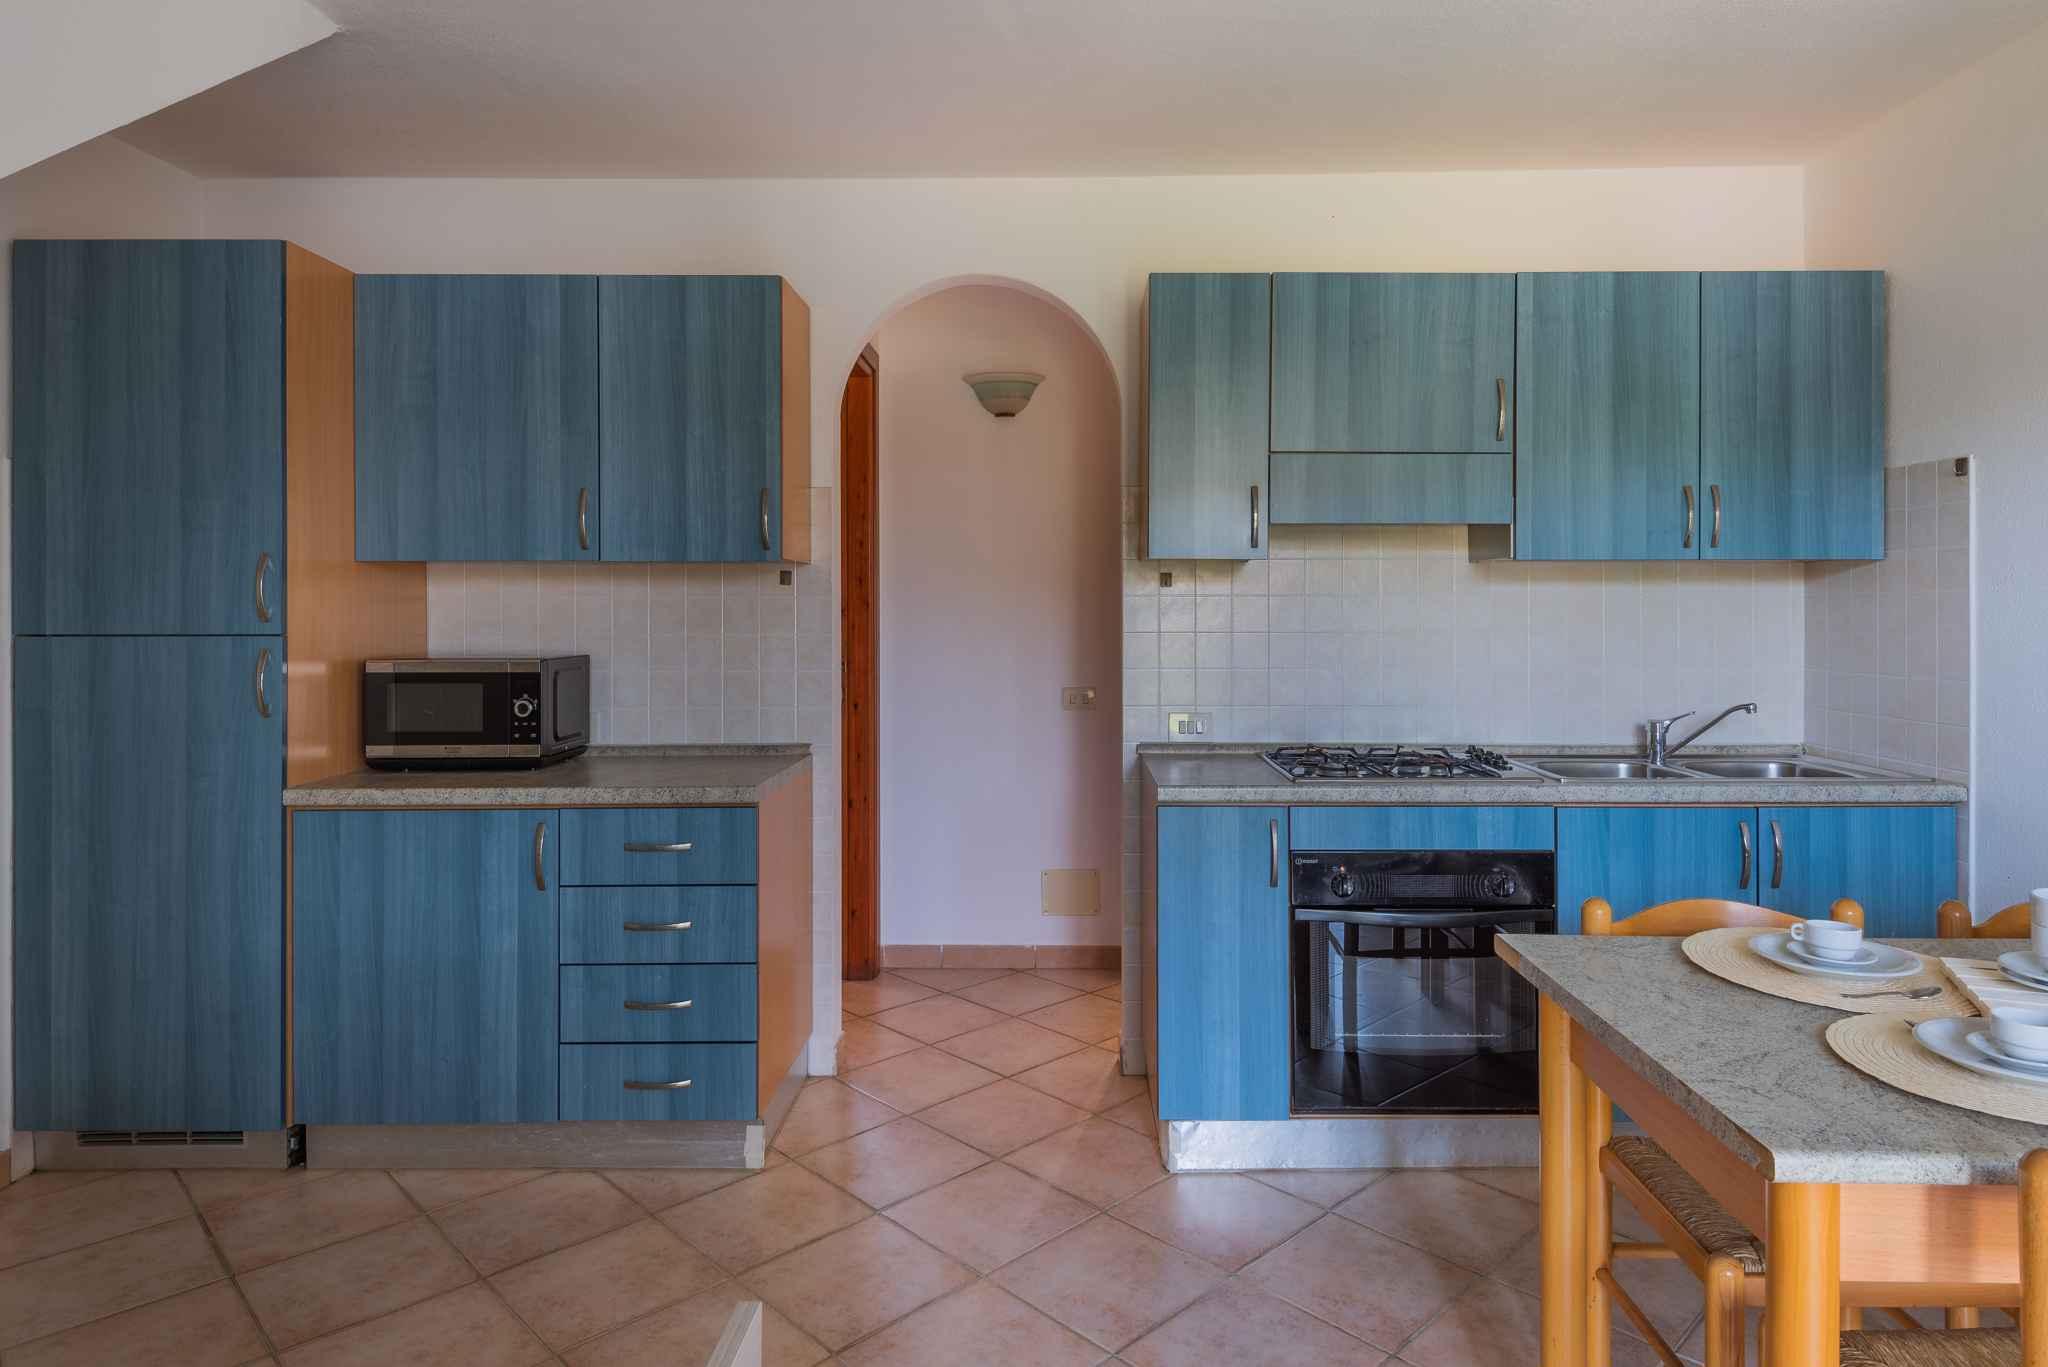 Ferienwohnung Appartamento 6 persone (2853261), Budoni, Olbia-Tempio, Sardinien, Italien, Bild 3